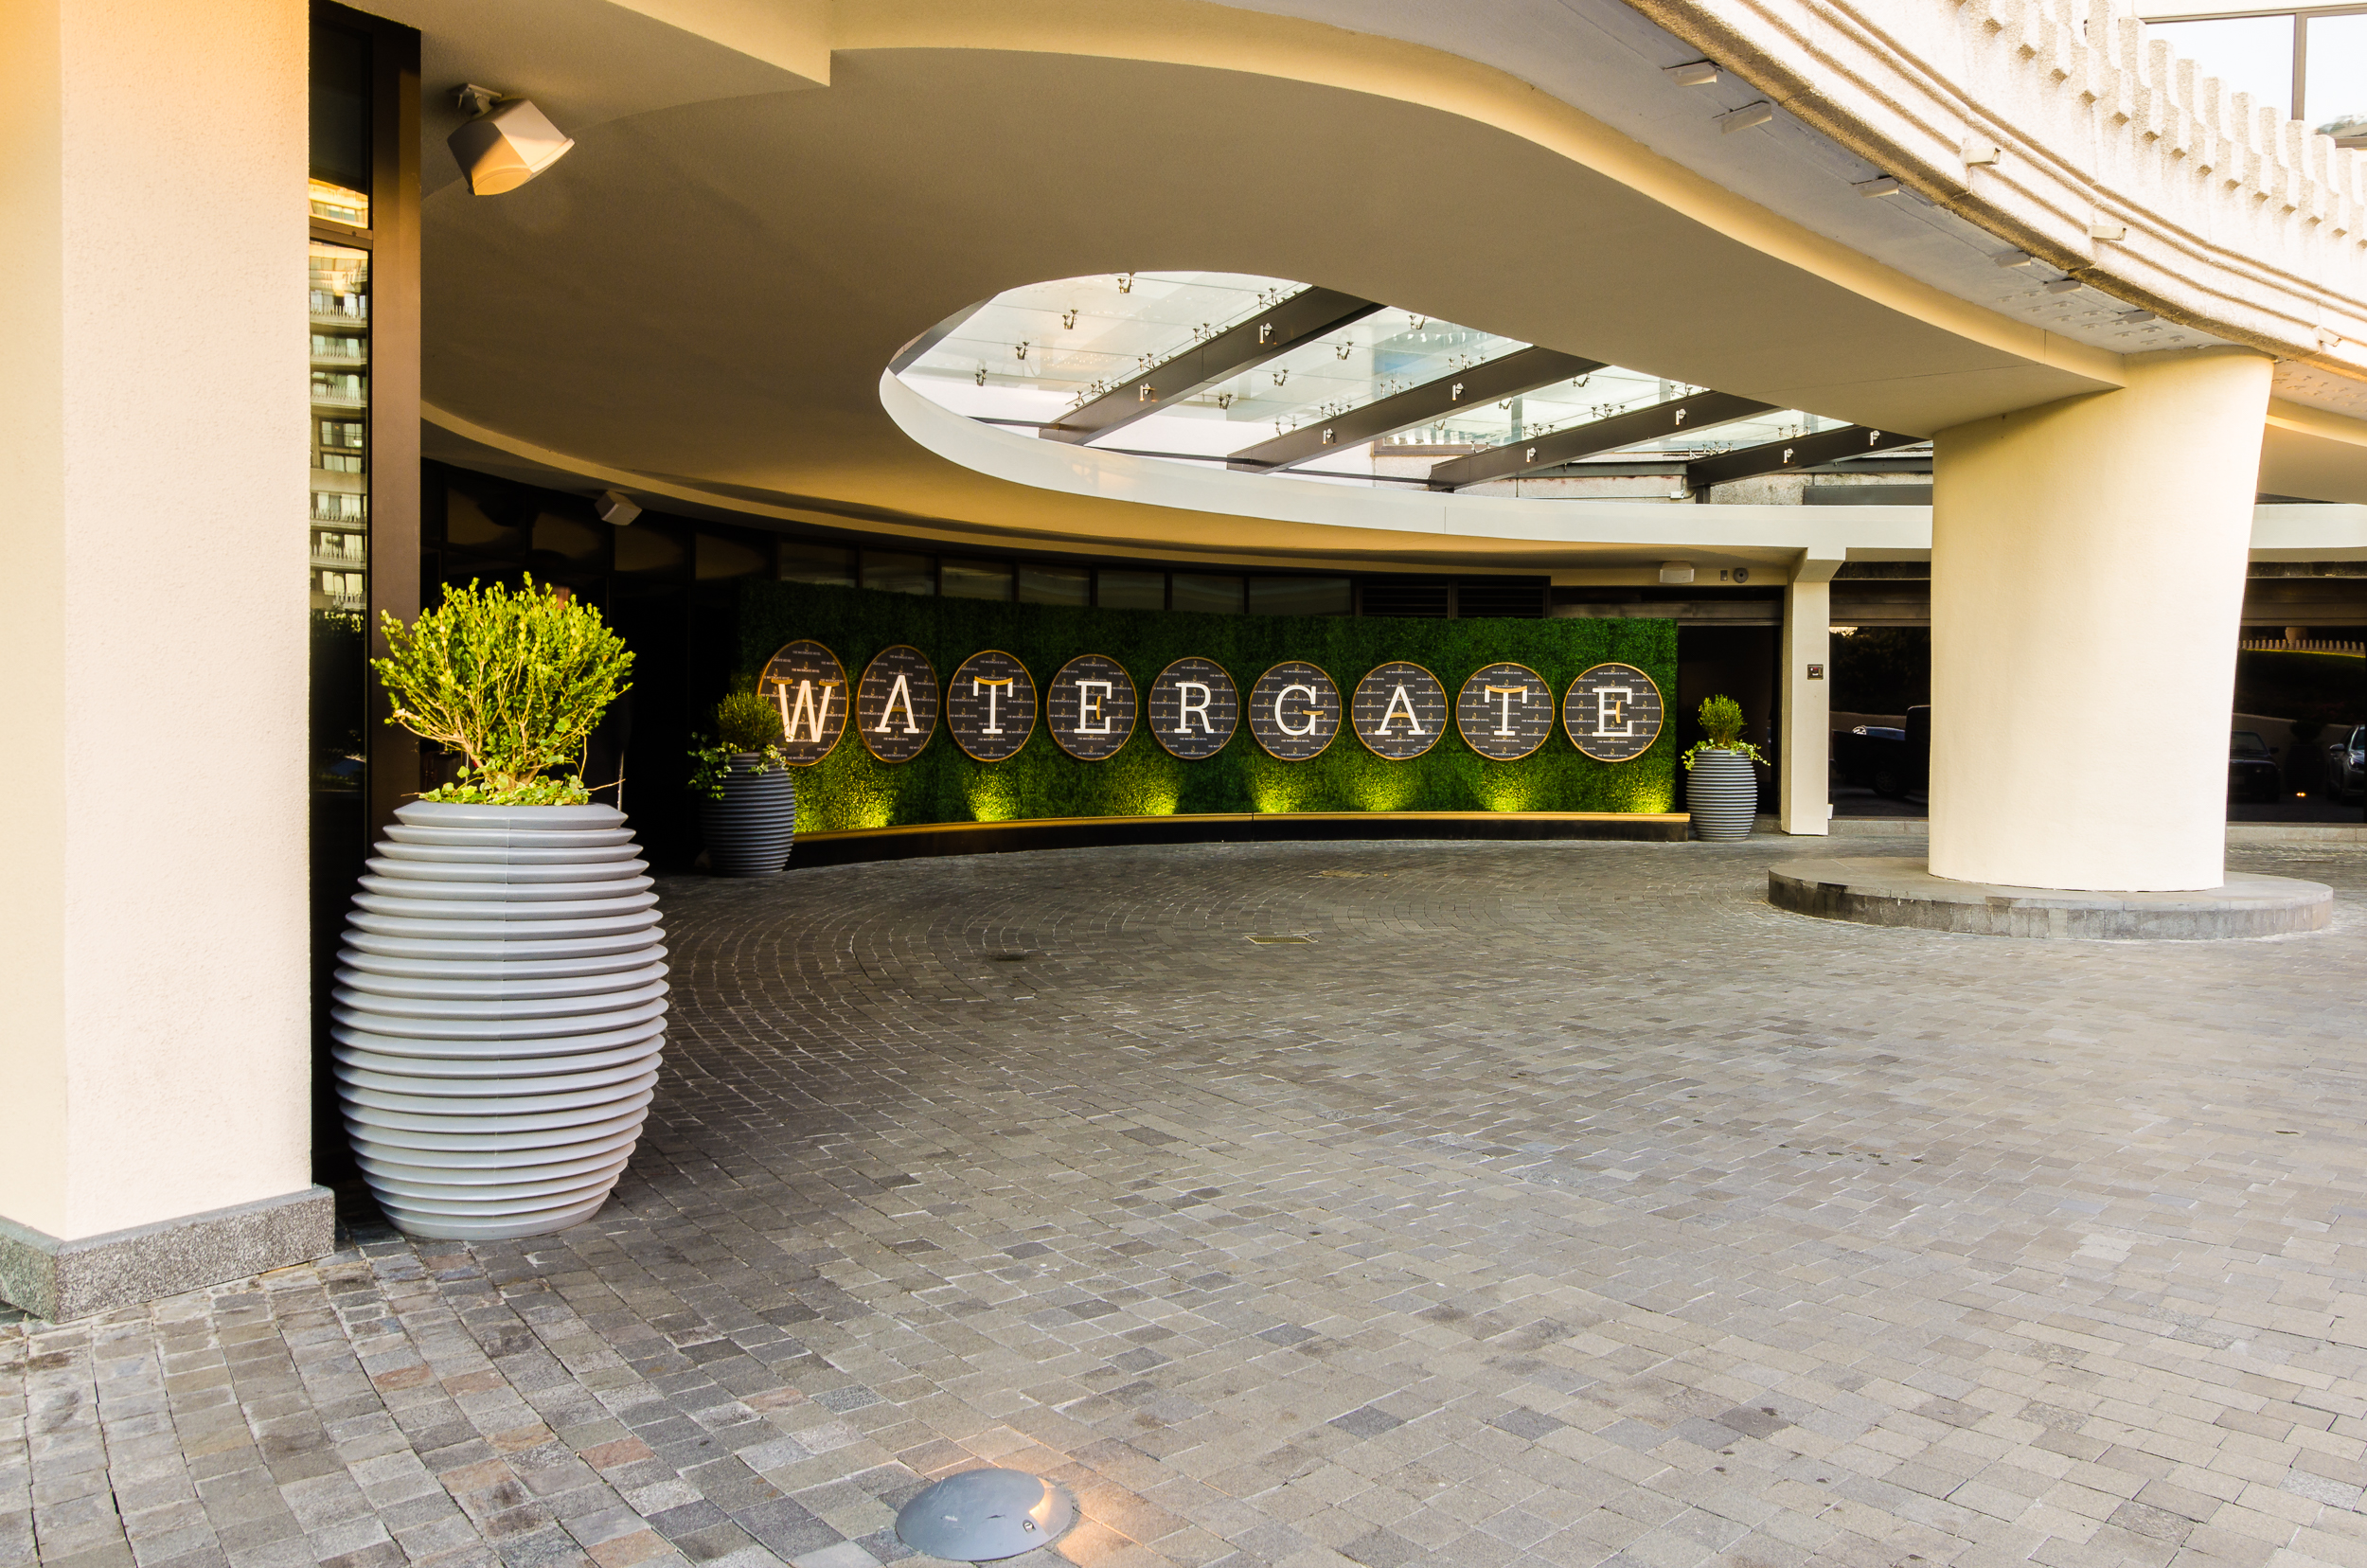 21_Watergate Hotel 01.jpg